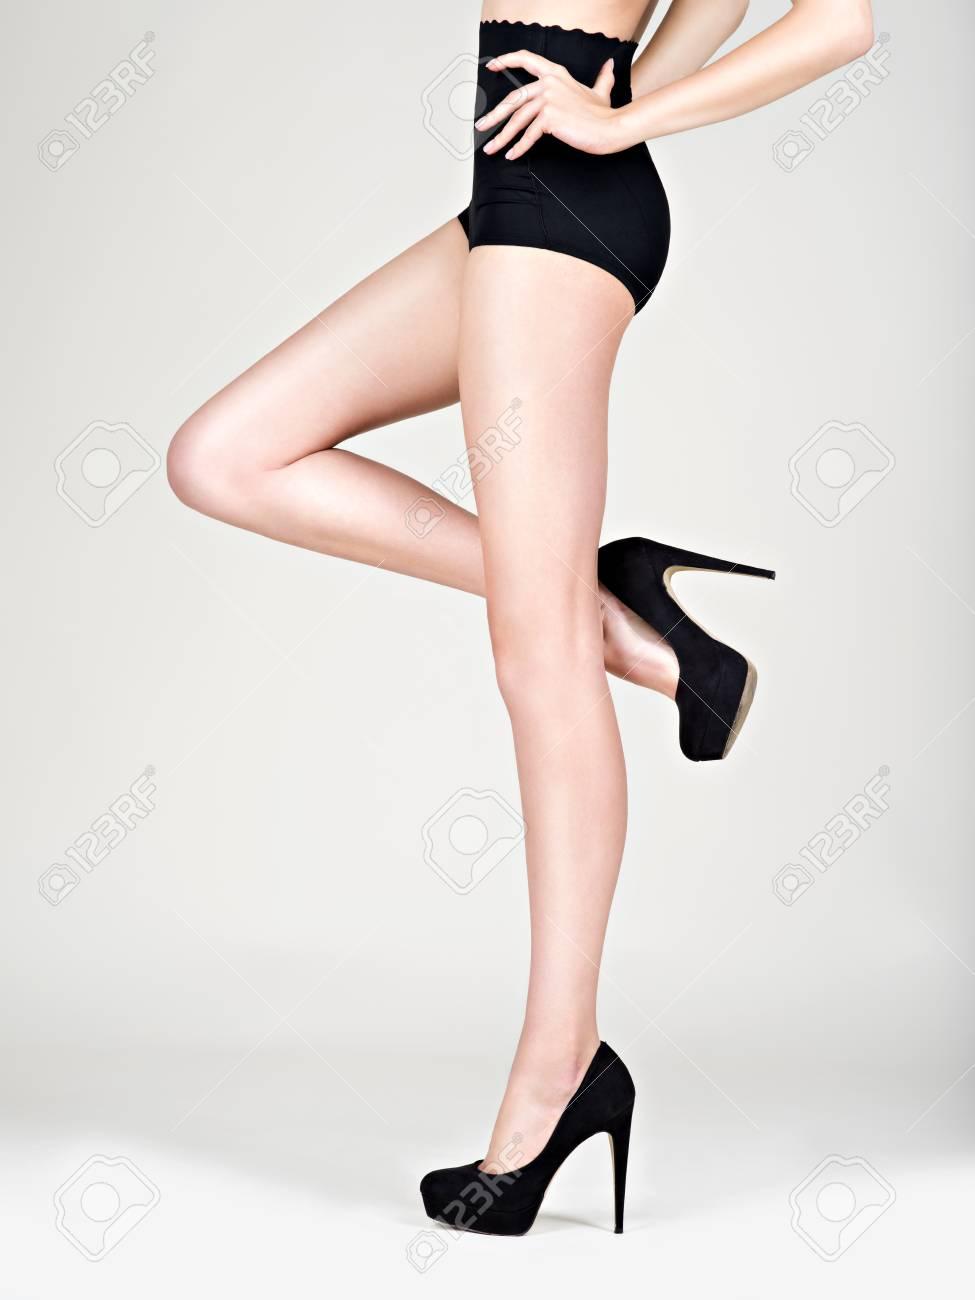 7d6c61e2b65 예쁜 여자 하이힐 패션, 검은 색 팬티 - 스튜디오 로열티 무료 사진 ...